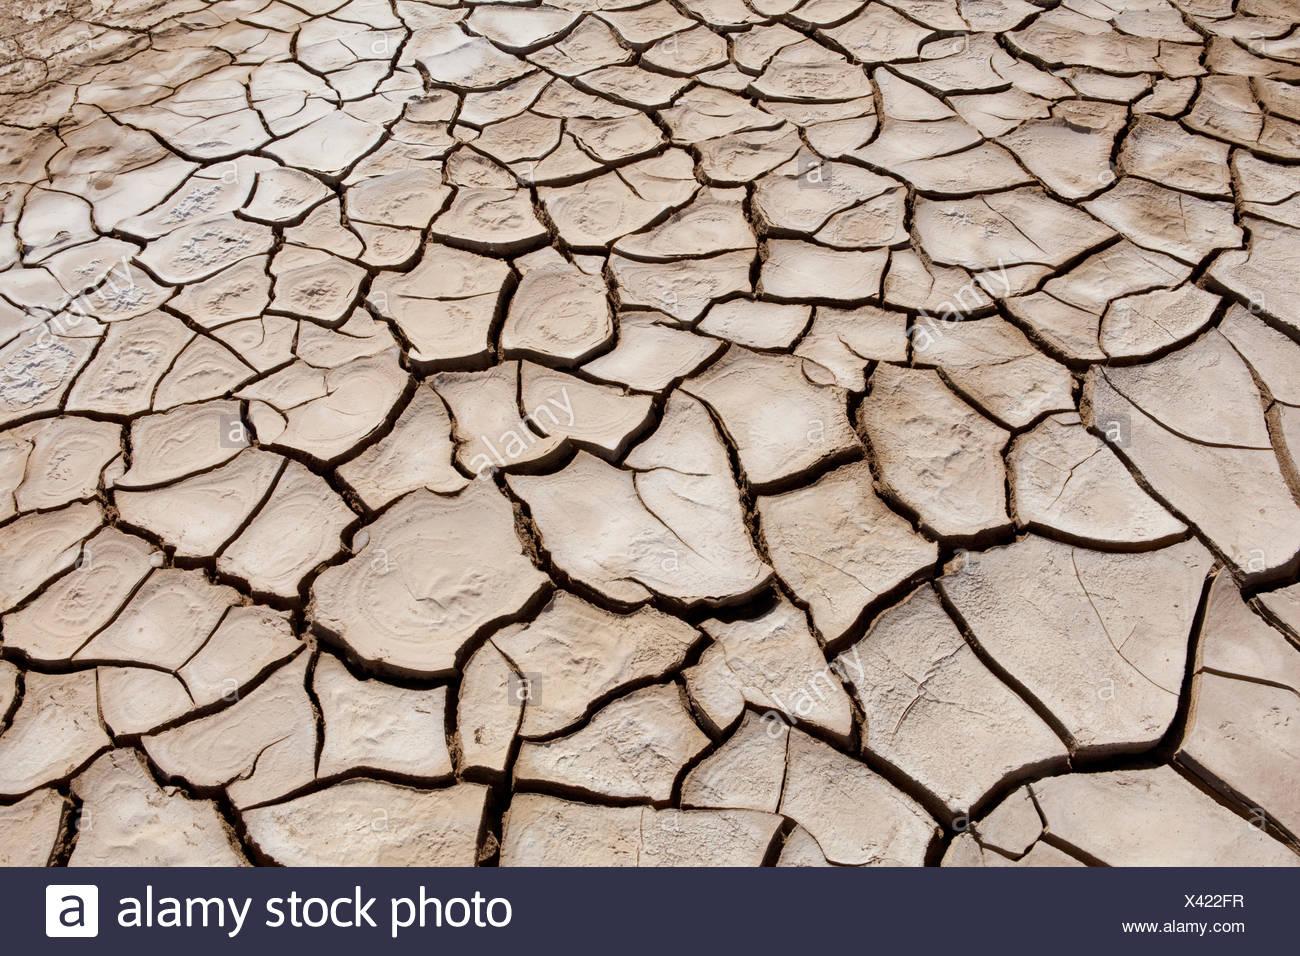 Danakil, Africa, Etiopia, drily, lacrime, terra, deserto Immagini Stock